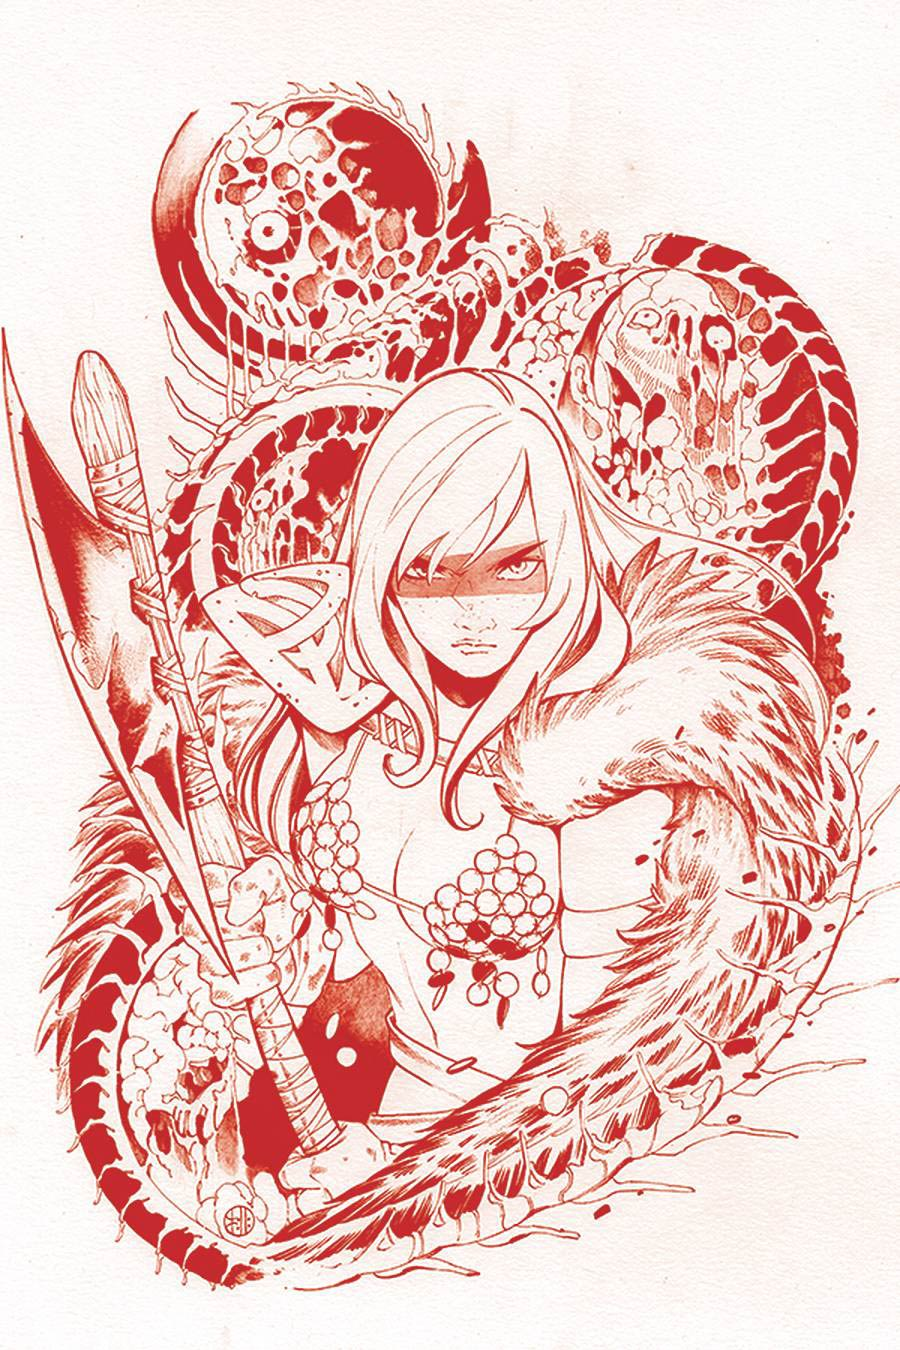 DieNamite #1 Cover Z-C Ultra-Premium Limited Edition Peach Momoko Red Sonja Crimson Red Line Art Virgin Cover